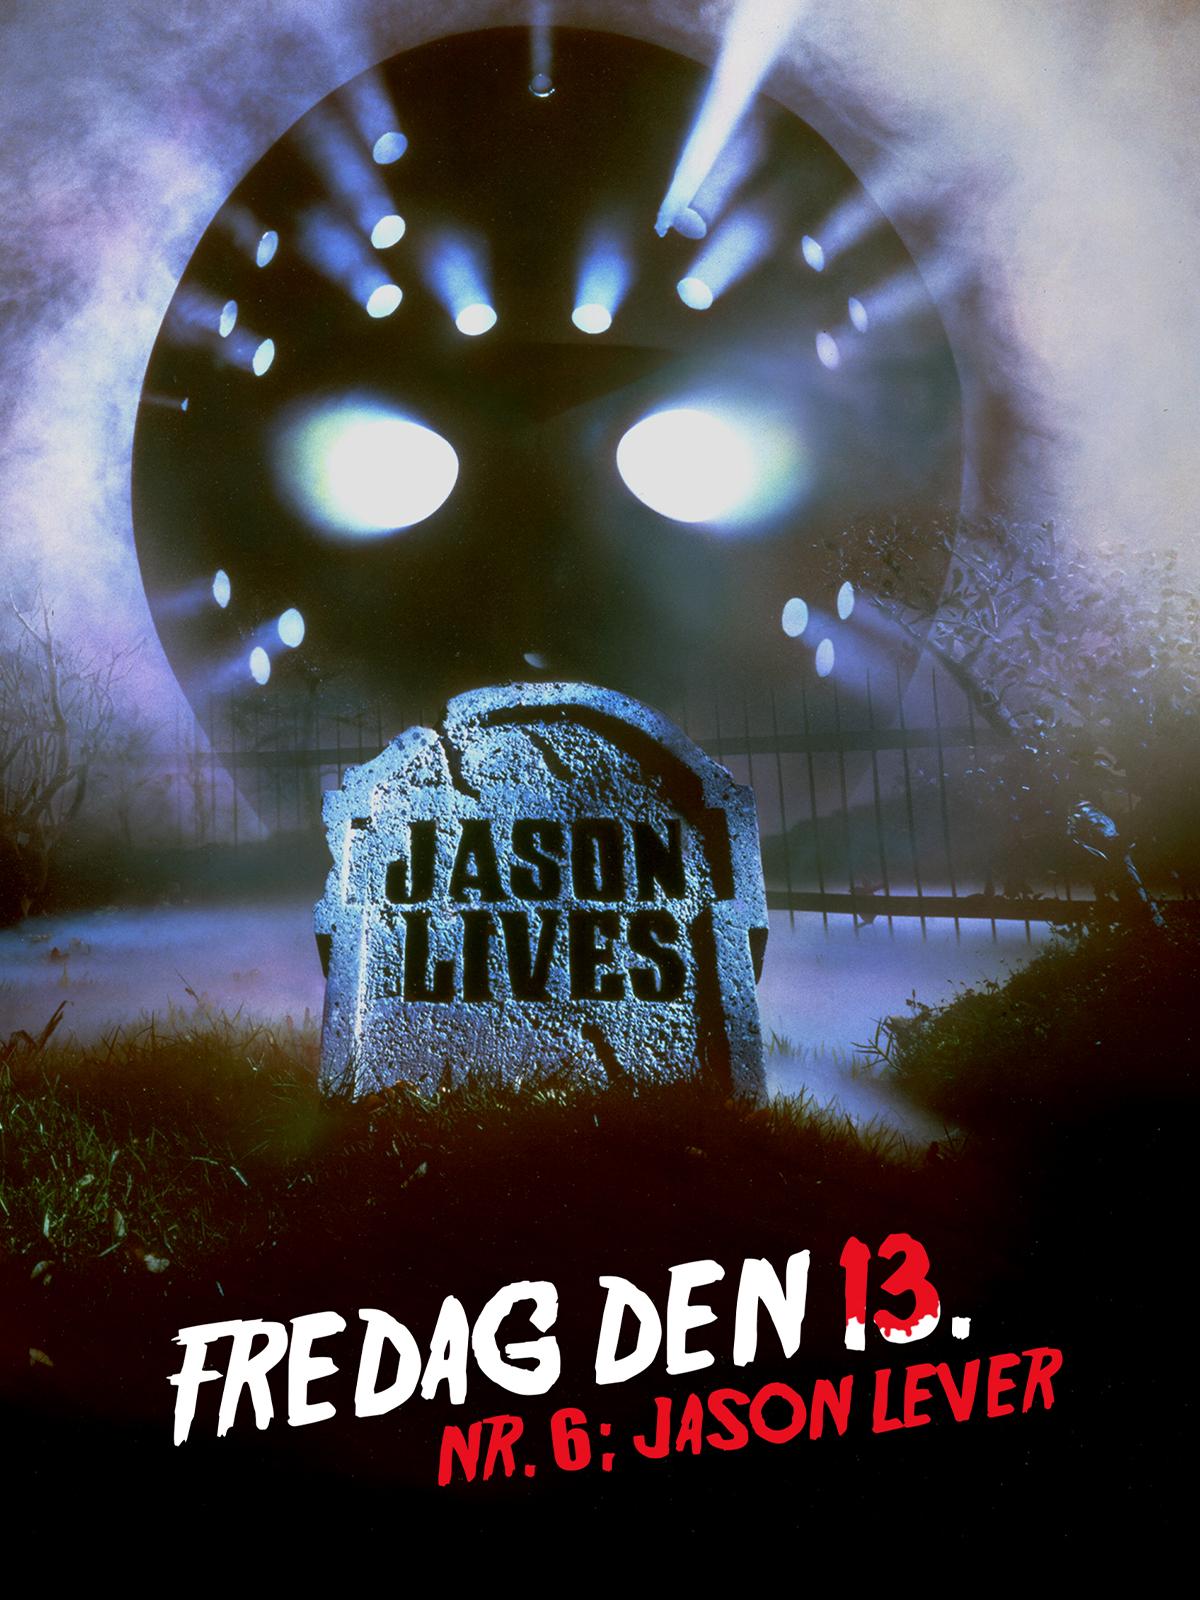 Fredag den 13. - nr. 6; Jason lever